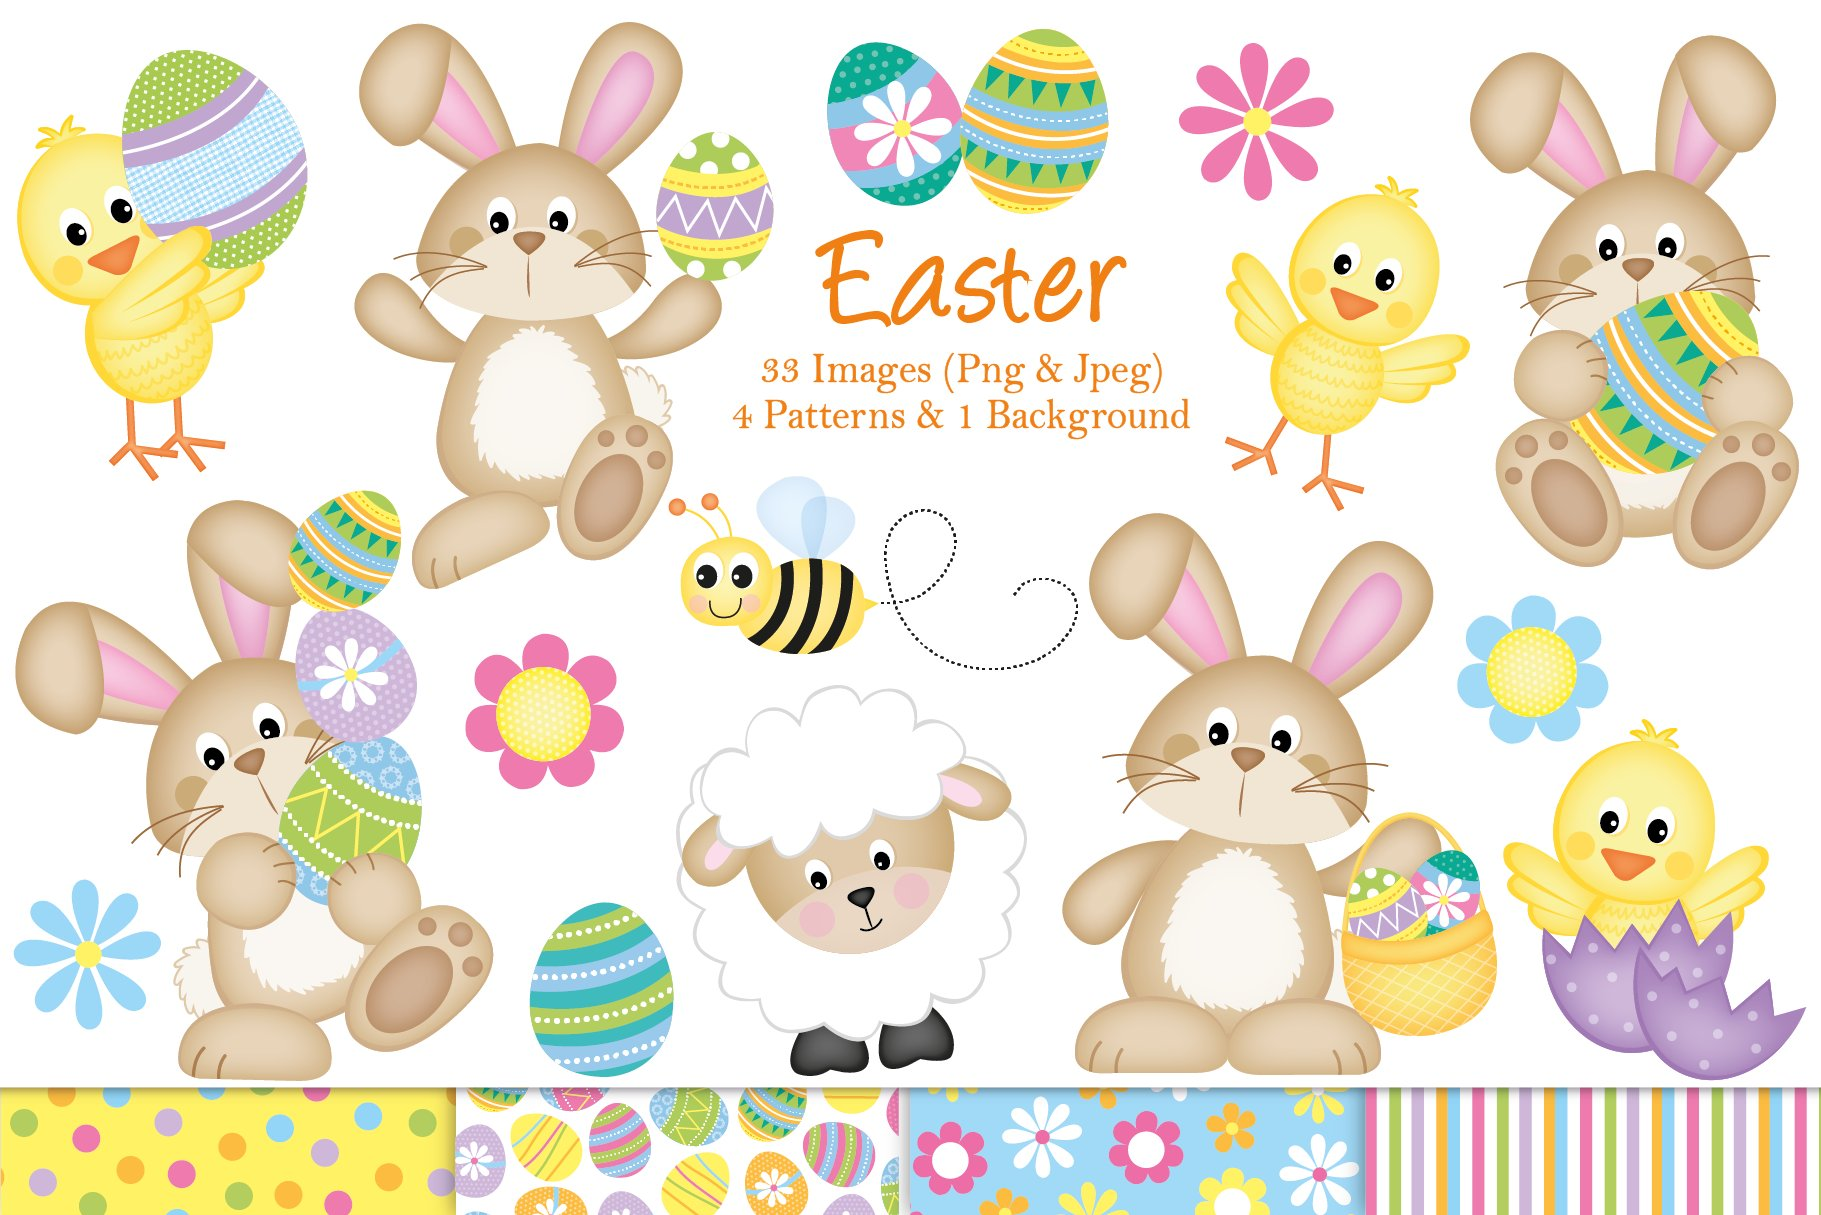 Easter Bunny Clipart ~ Illustrations ~ Creative Market